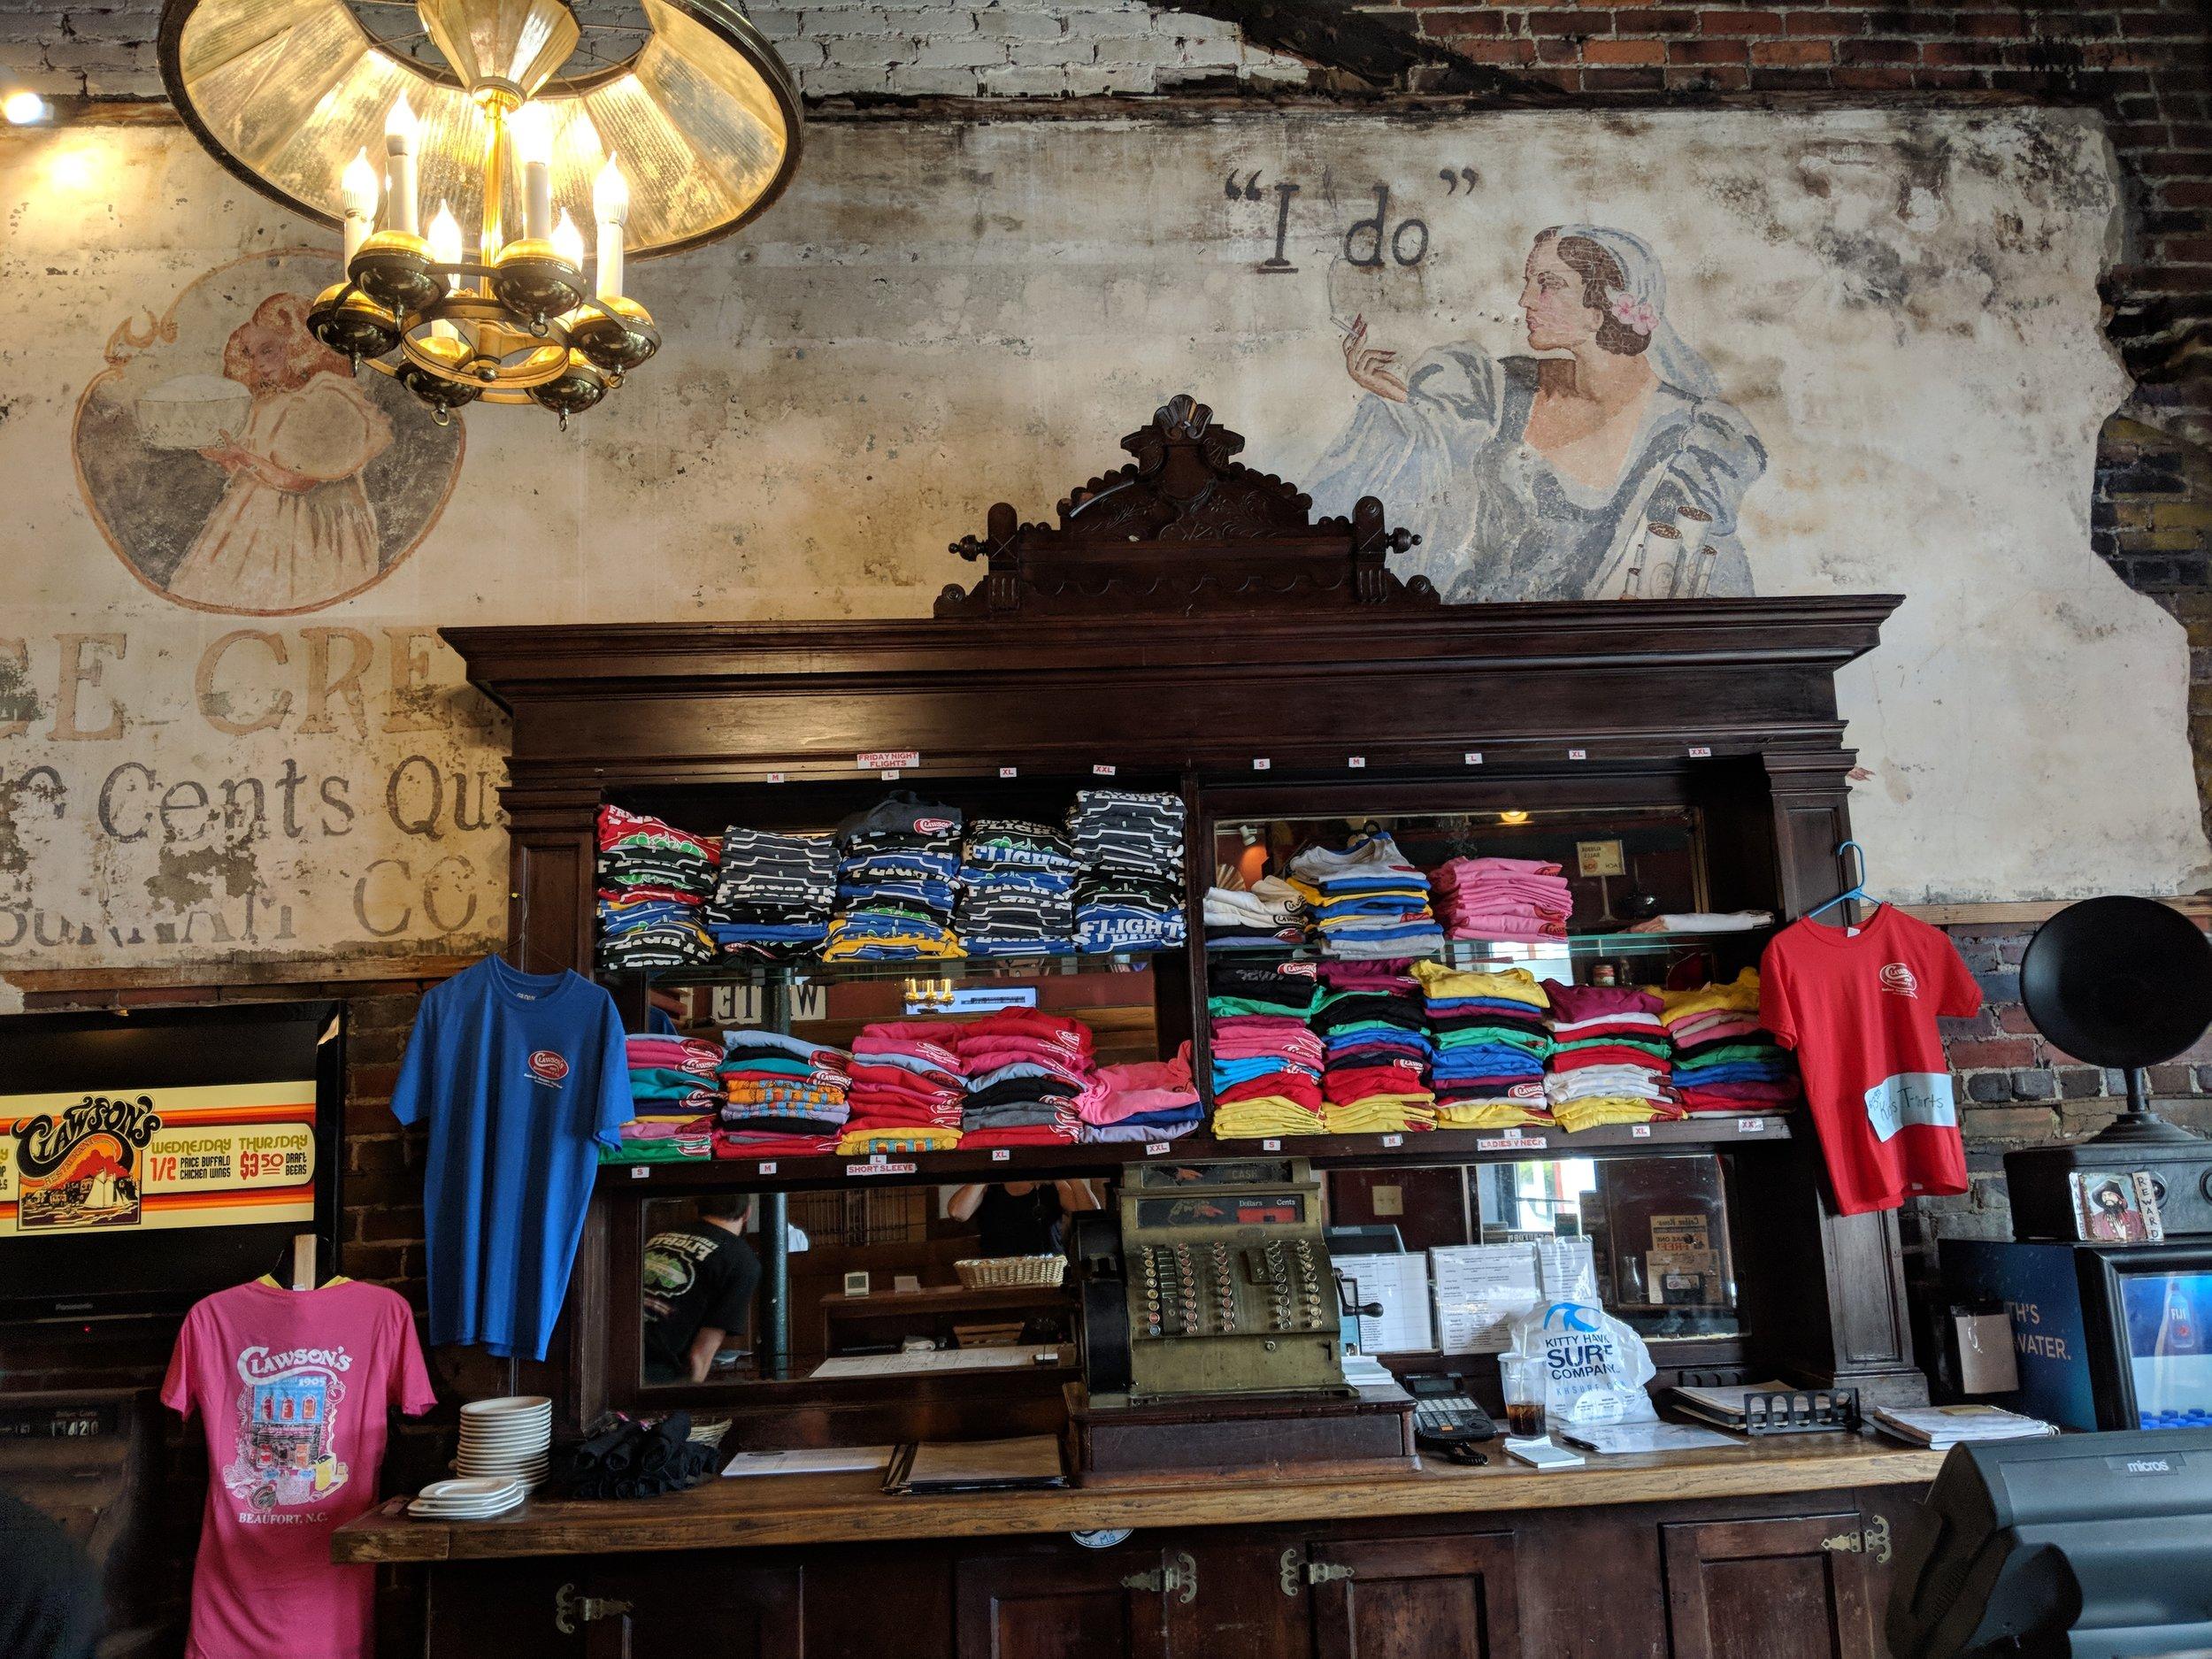 Old antique murals, cash register and display.